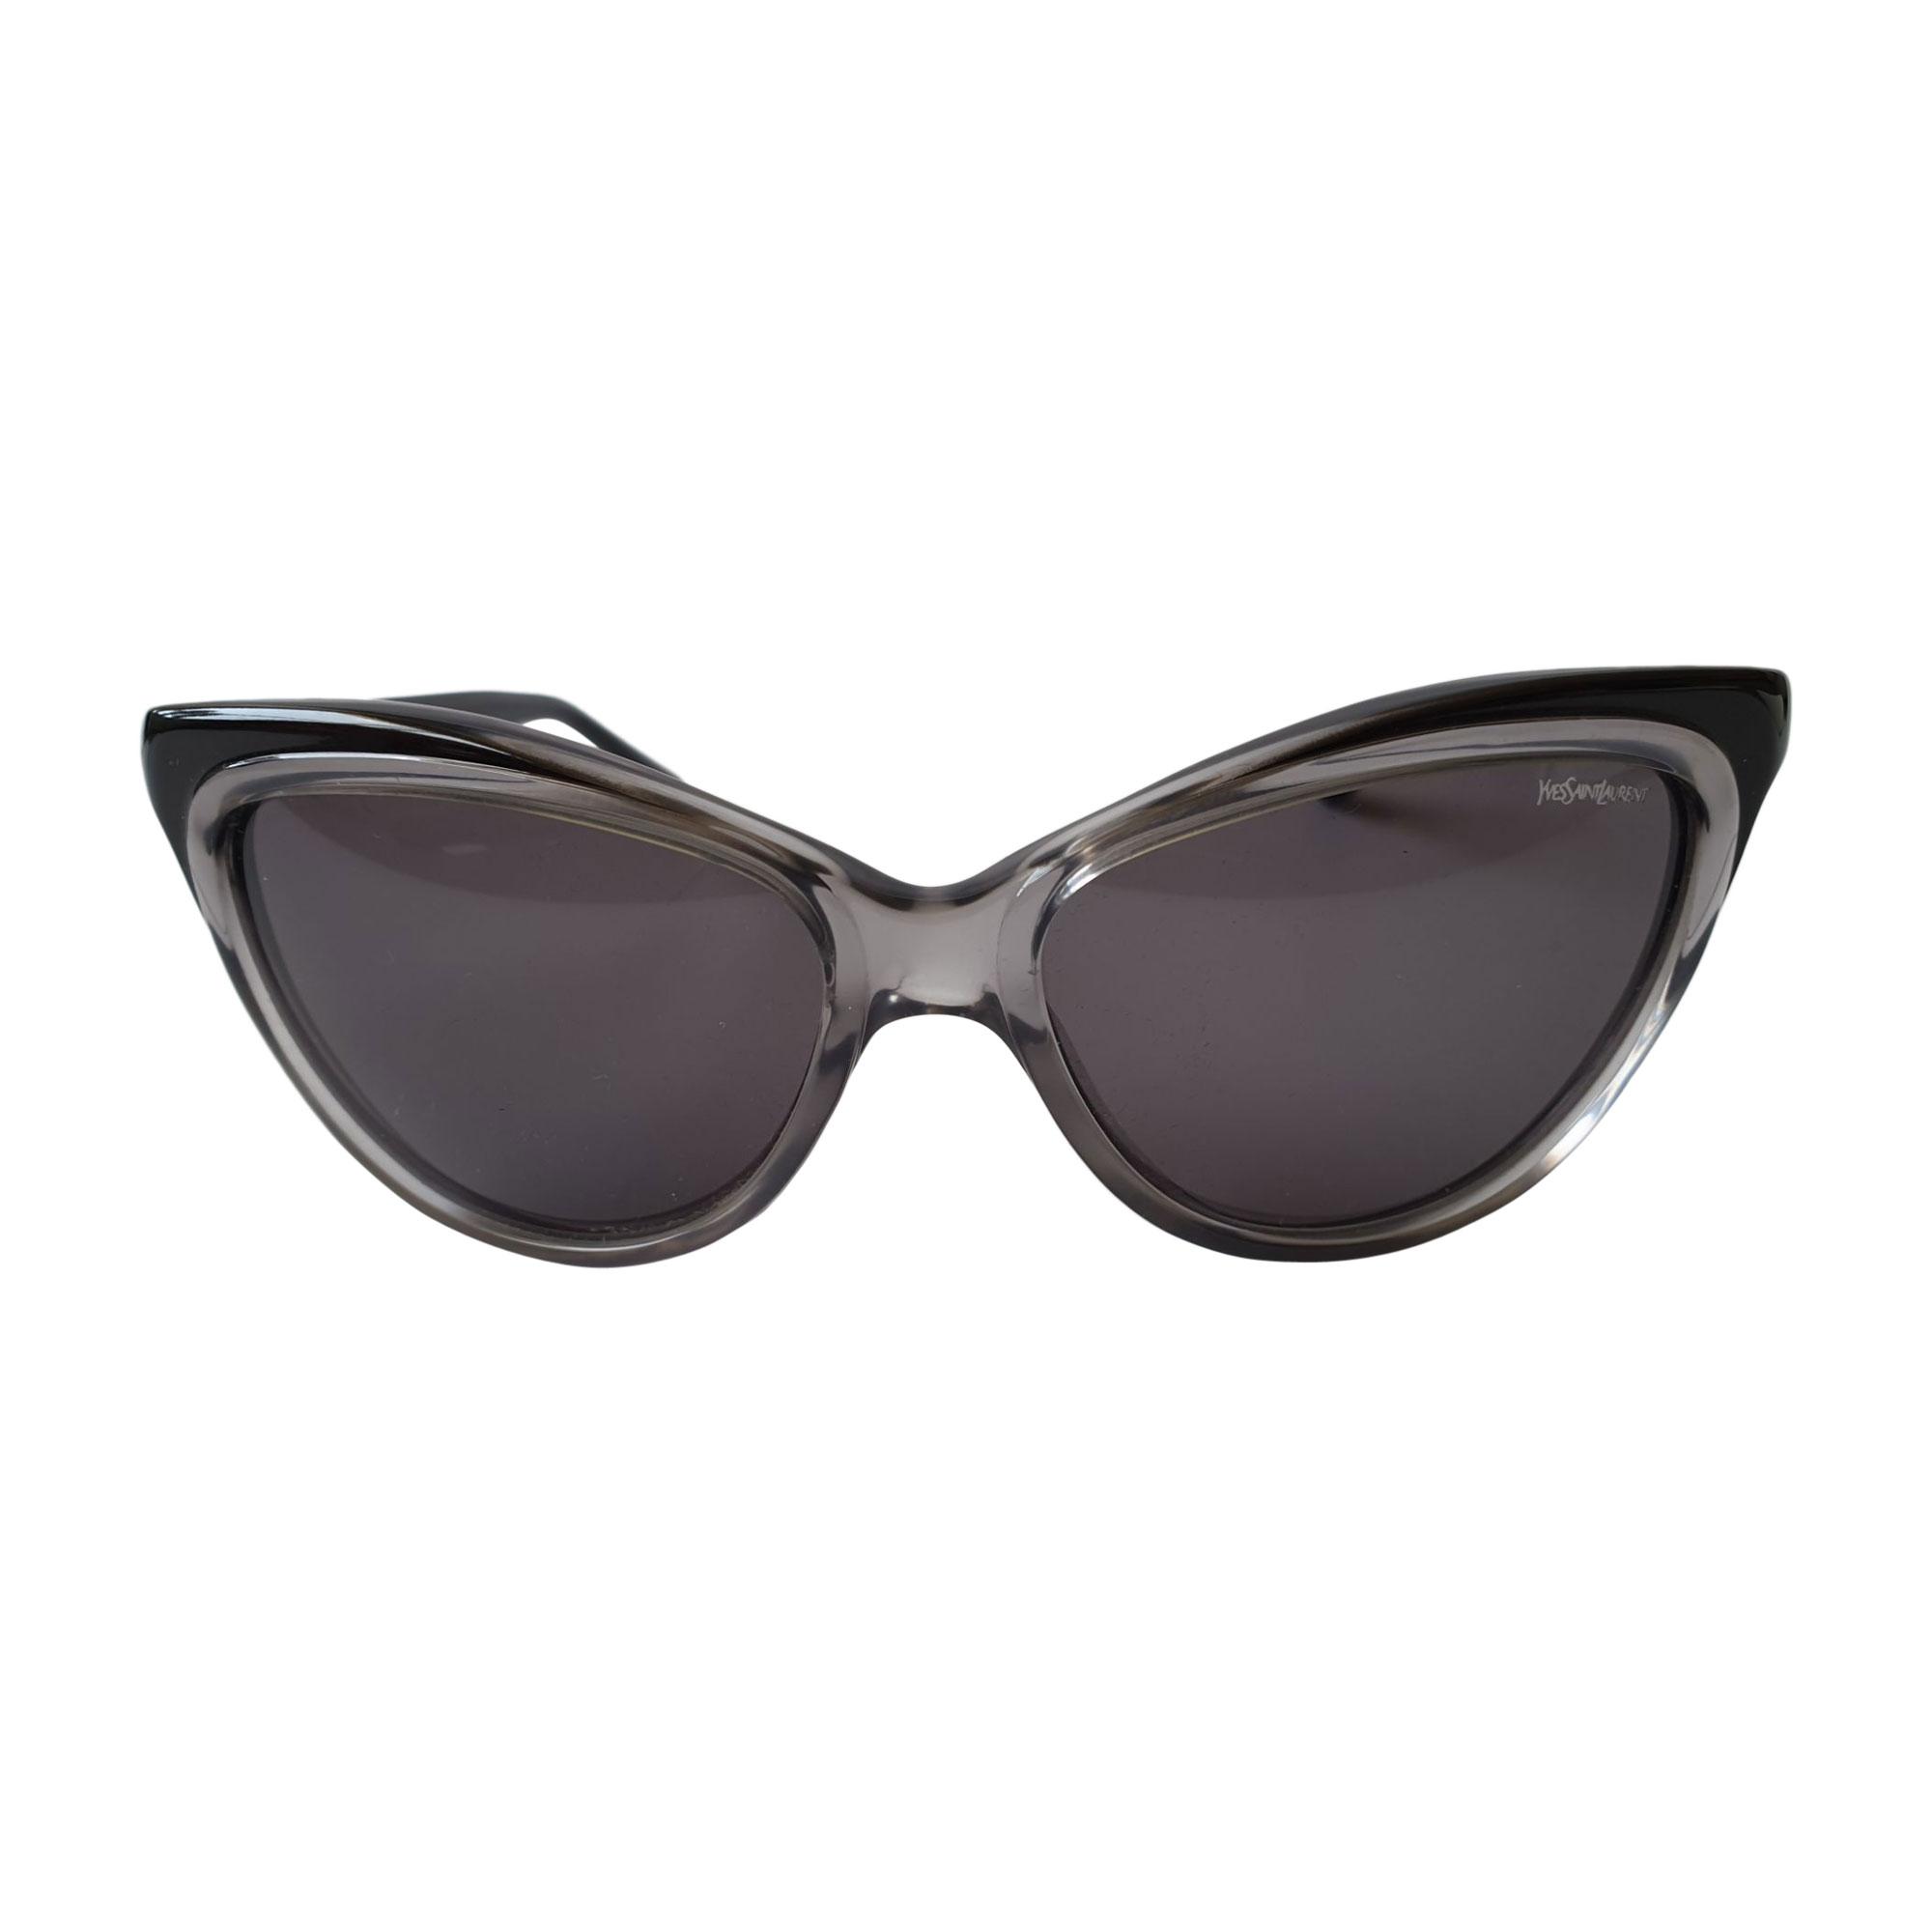 Sunglasses YVES SAINT LAURENT Gray, charcoal